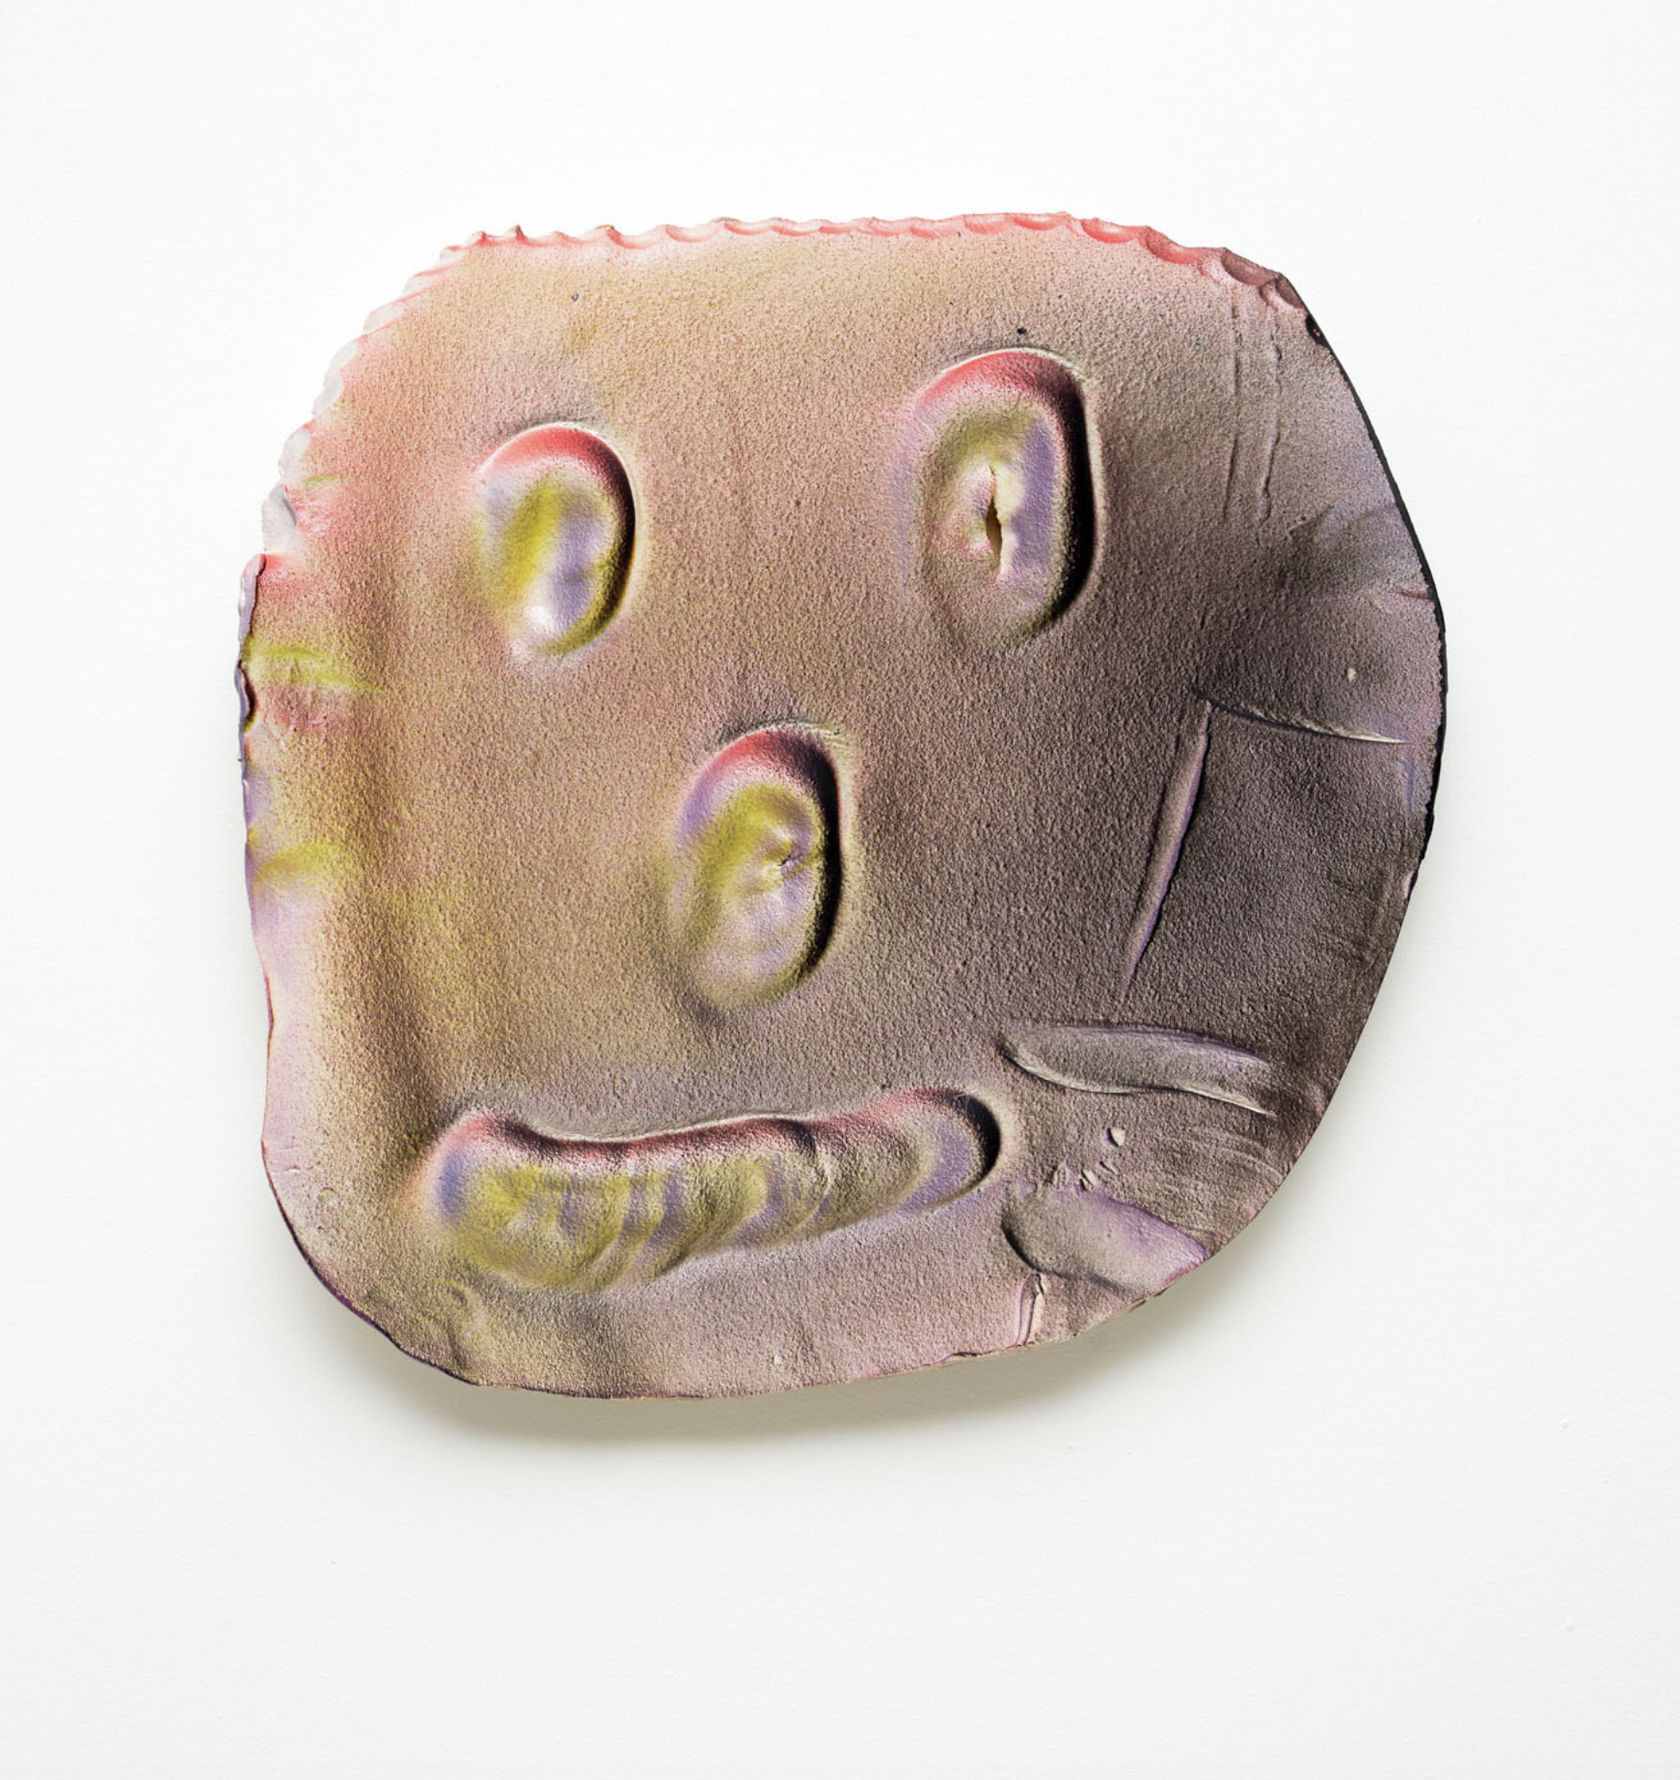 Dan McCarthy, Space Ghost # 44, 2015 Céramique39 × 38 × 5 cm / 15 1/4 × 15 × 2 in.